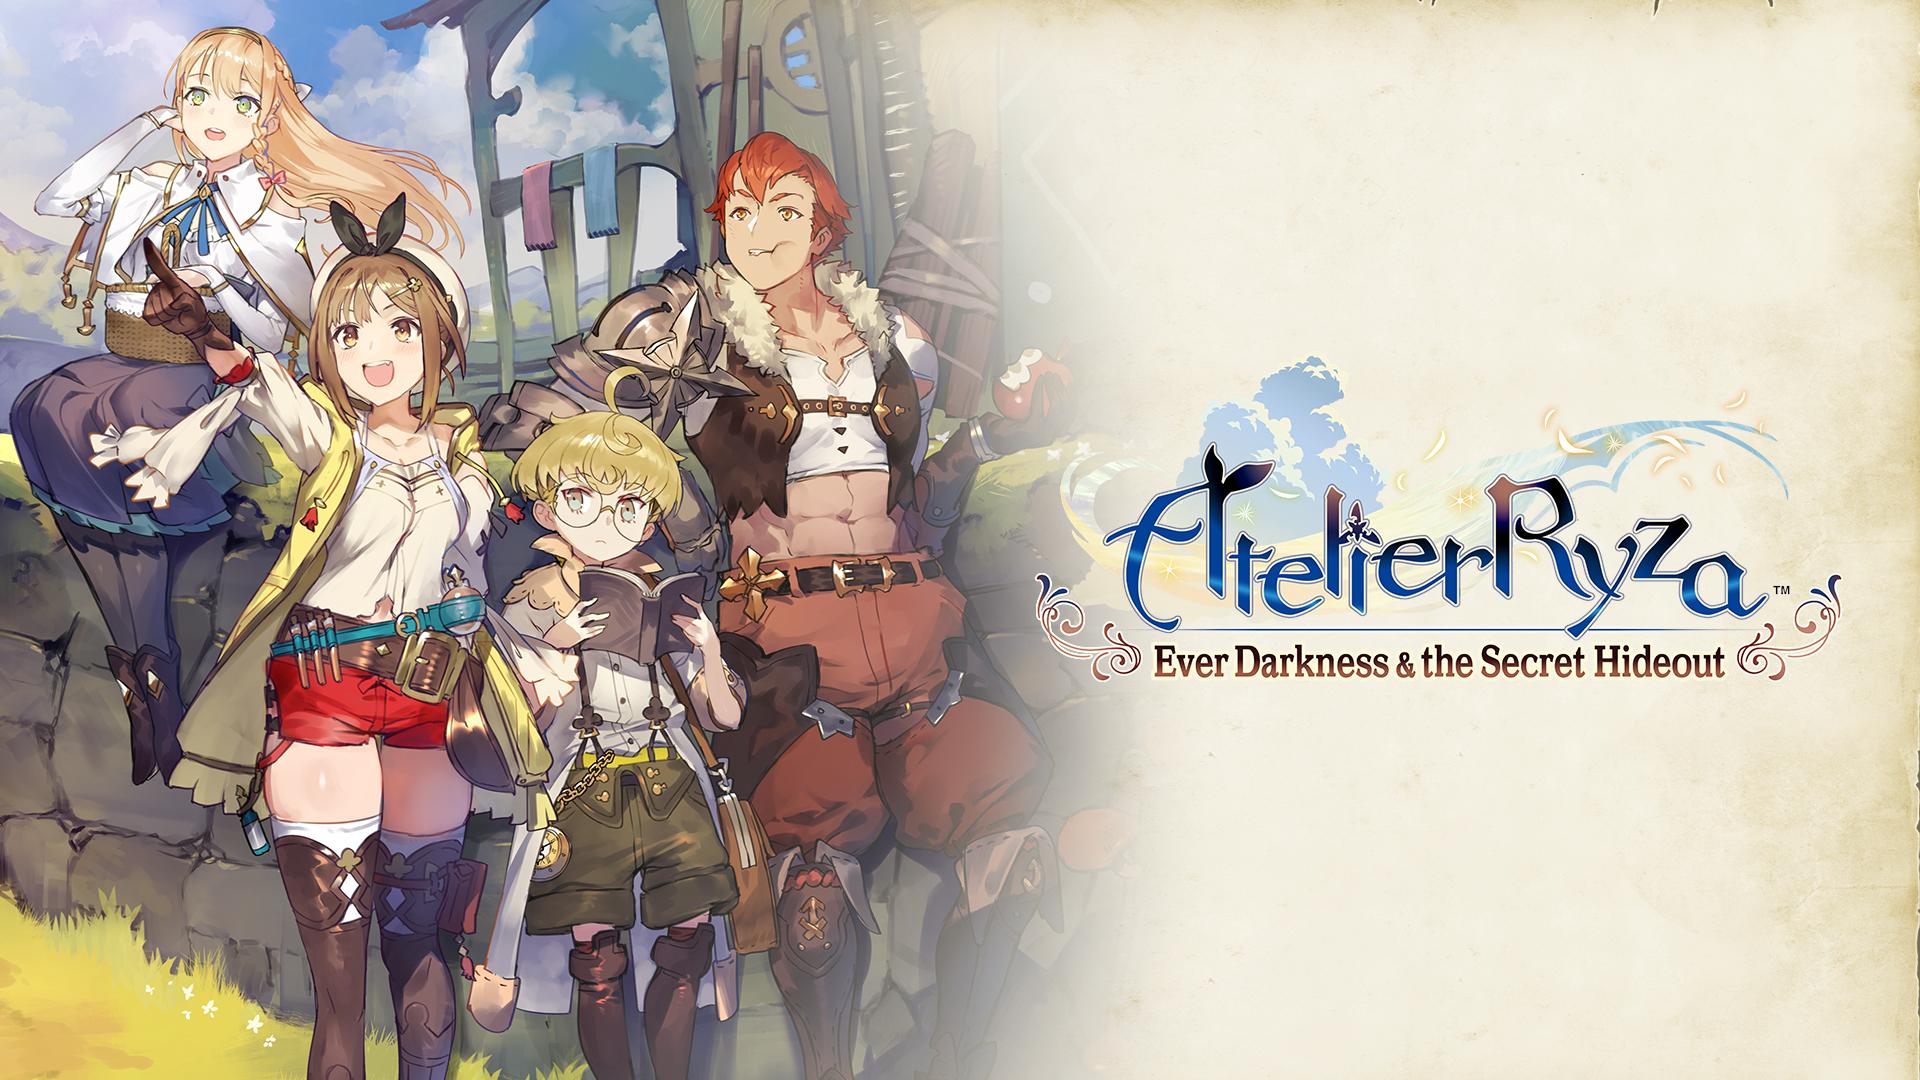 Nintendo, Atelier Ryza: Ever Darkness & the Secret Hideout (Switch)